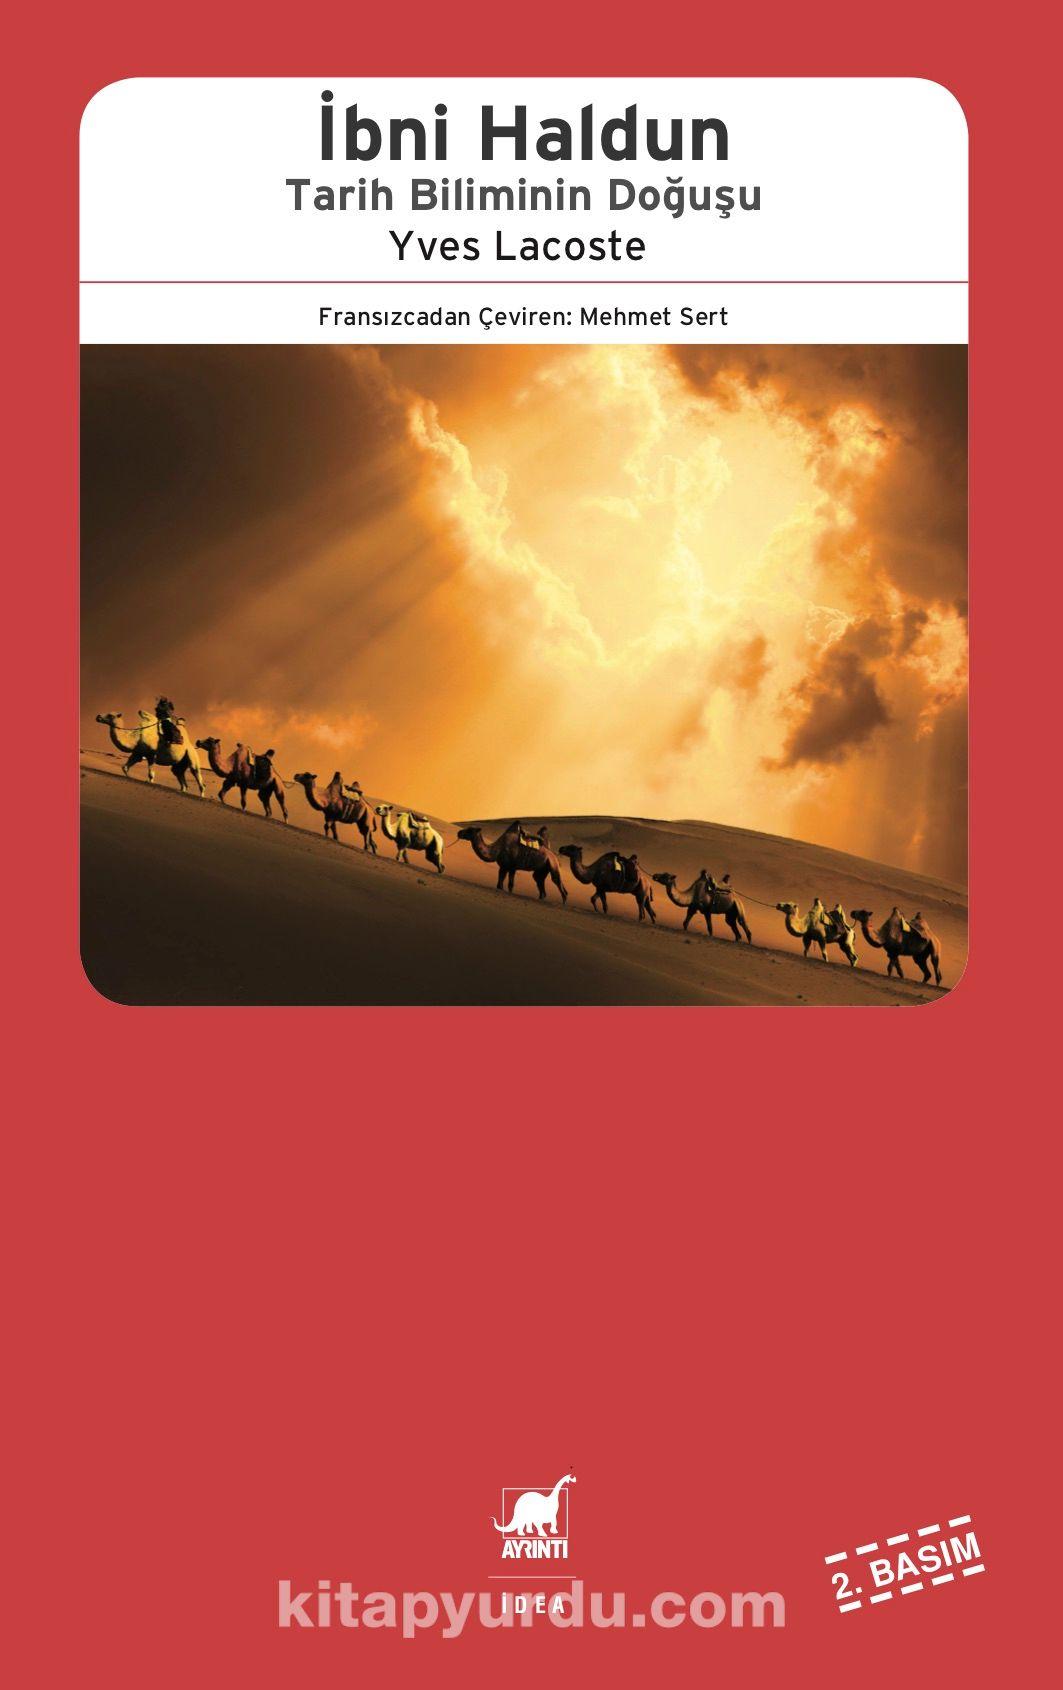 İbni Haldun: Tarih Biliminin Doğuşu - Yves Lacoste pdf epub